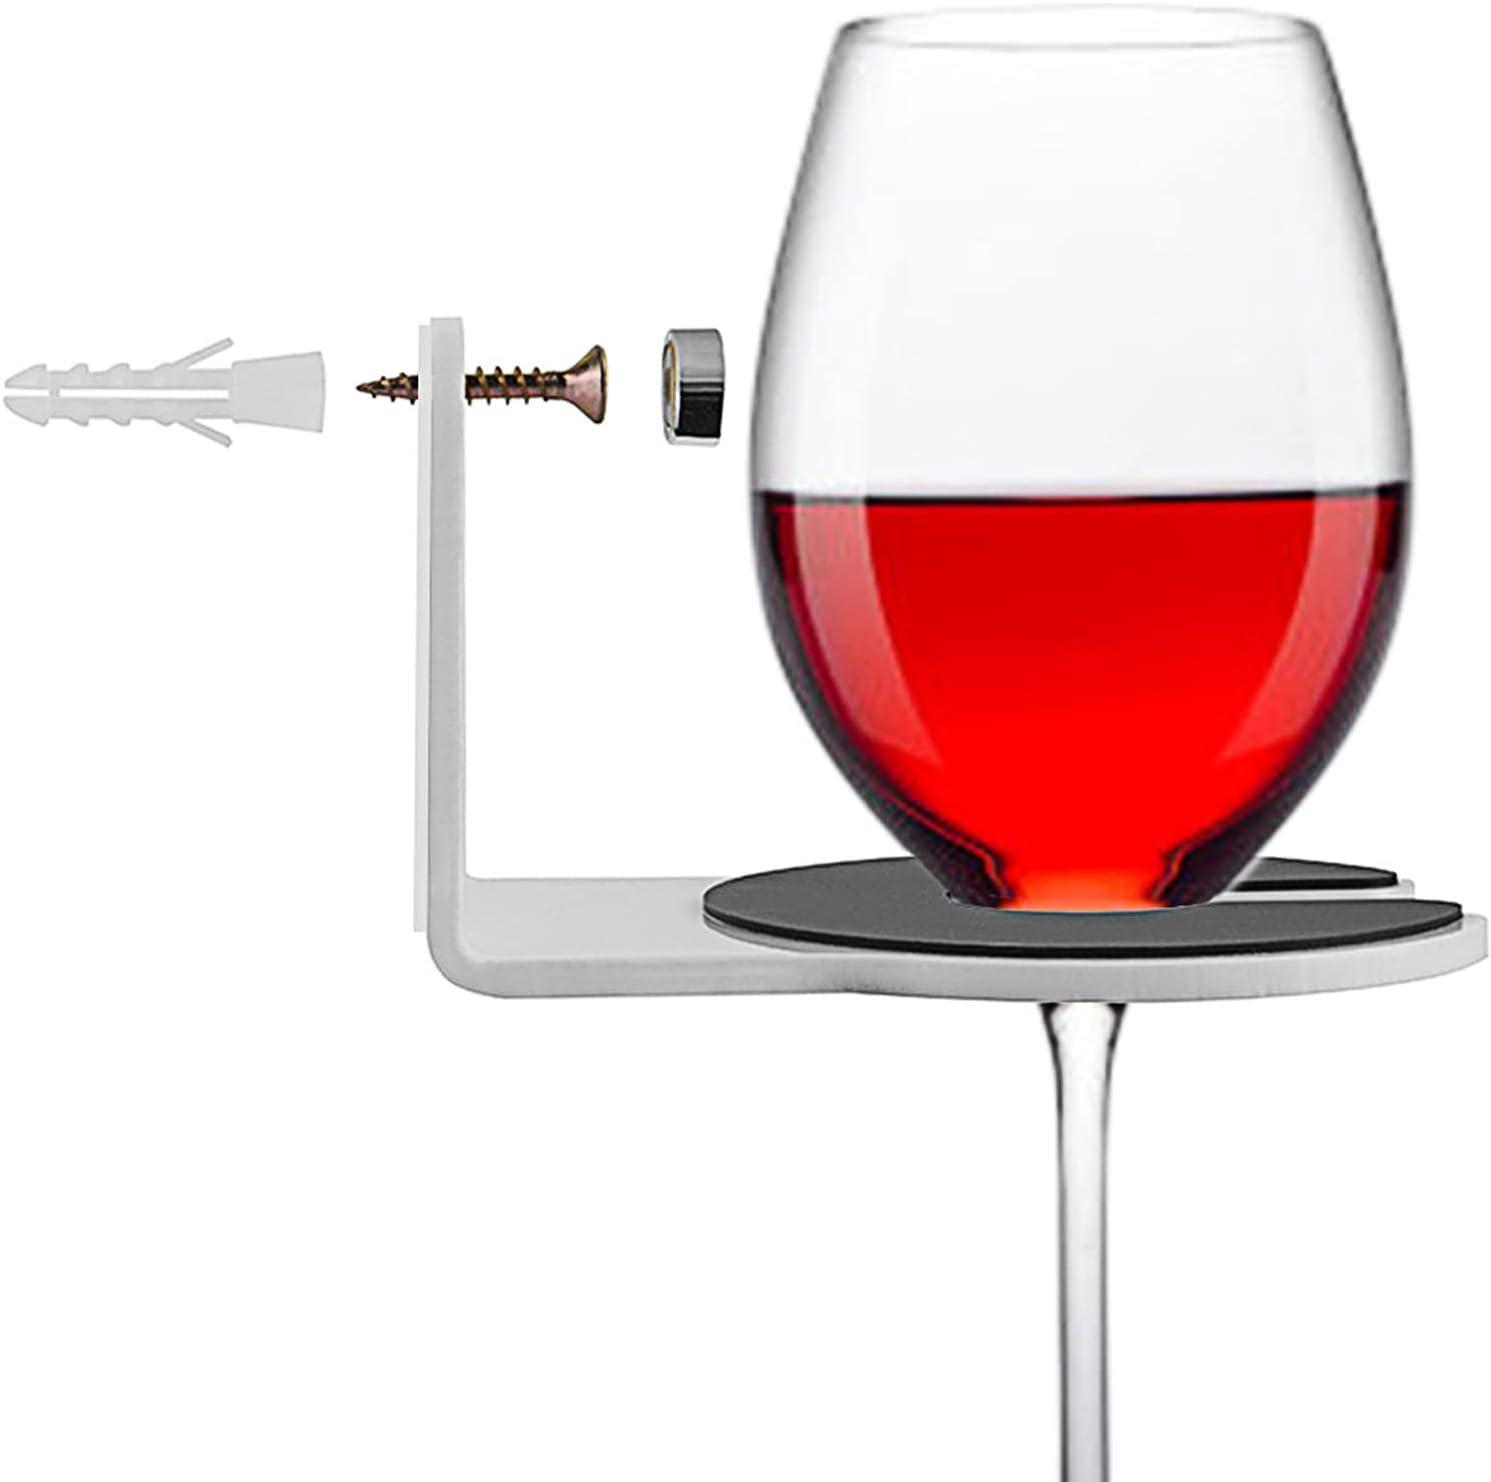 AOFETE Wine Nippon regular agency Glass Holder Max 87% OFF for Beve Cupholder Acrylic Bathtub